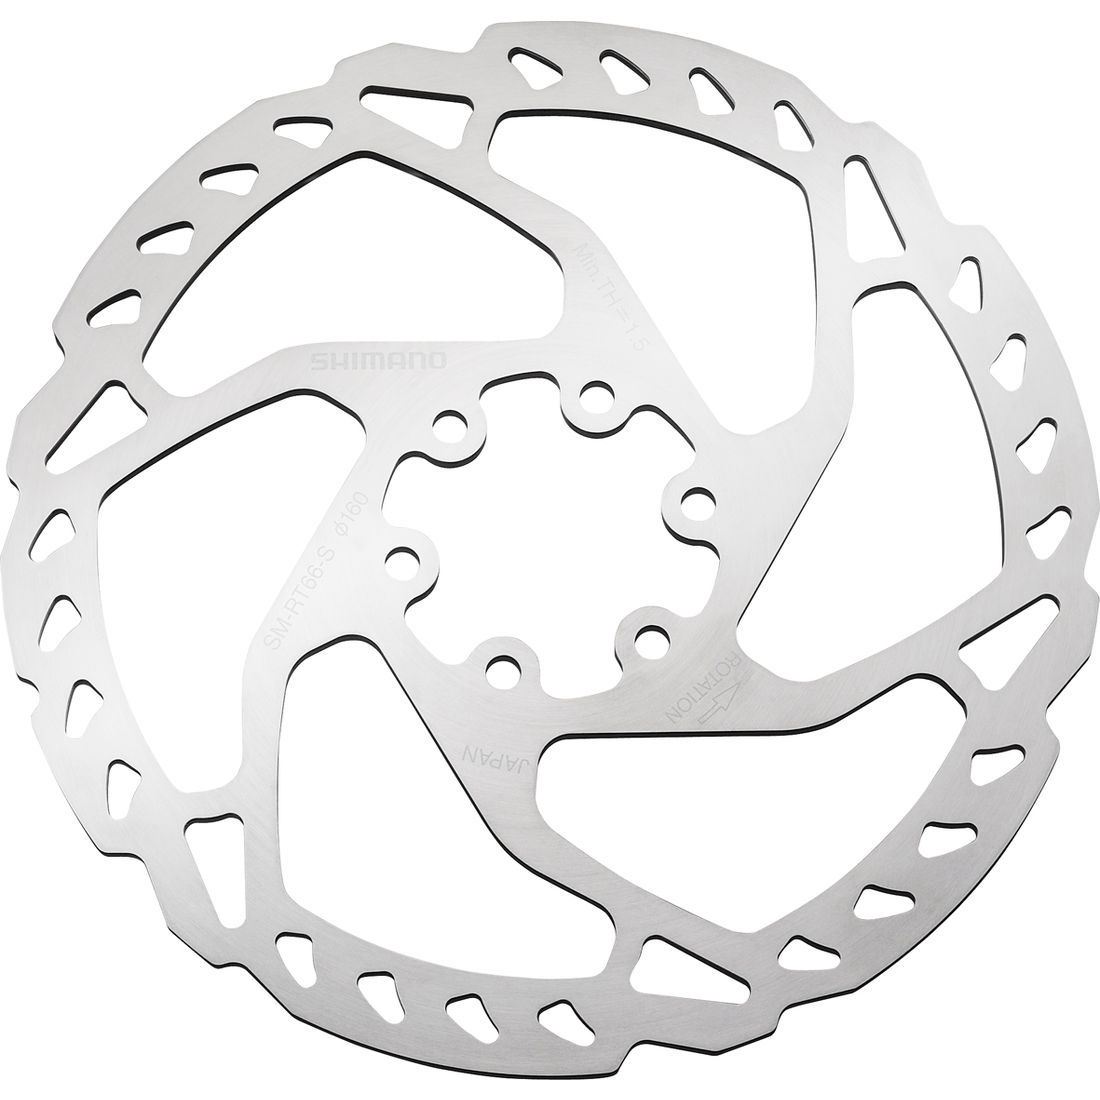 Shimano SLX/Zee RT66 6-Bolt Disc Brake Rotor : 180mm-0